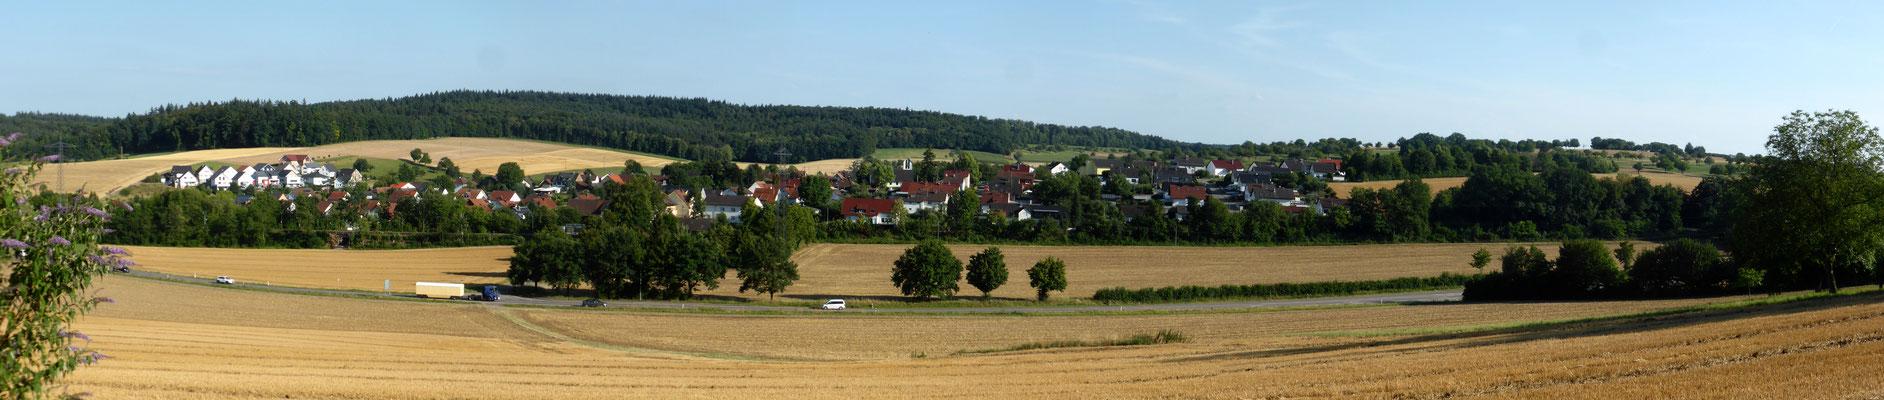 Panoramabild Volkmar Klünder 17/07/2018